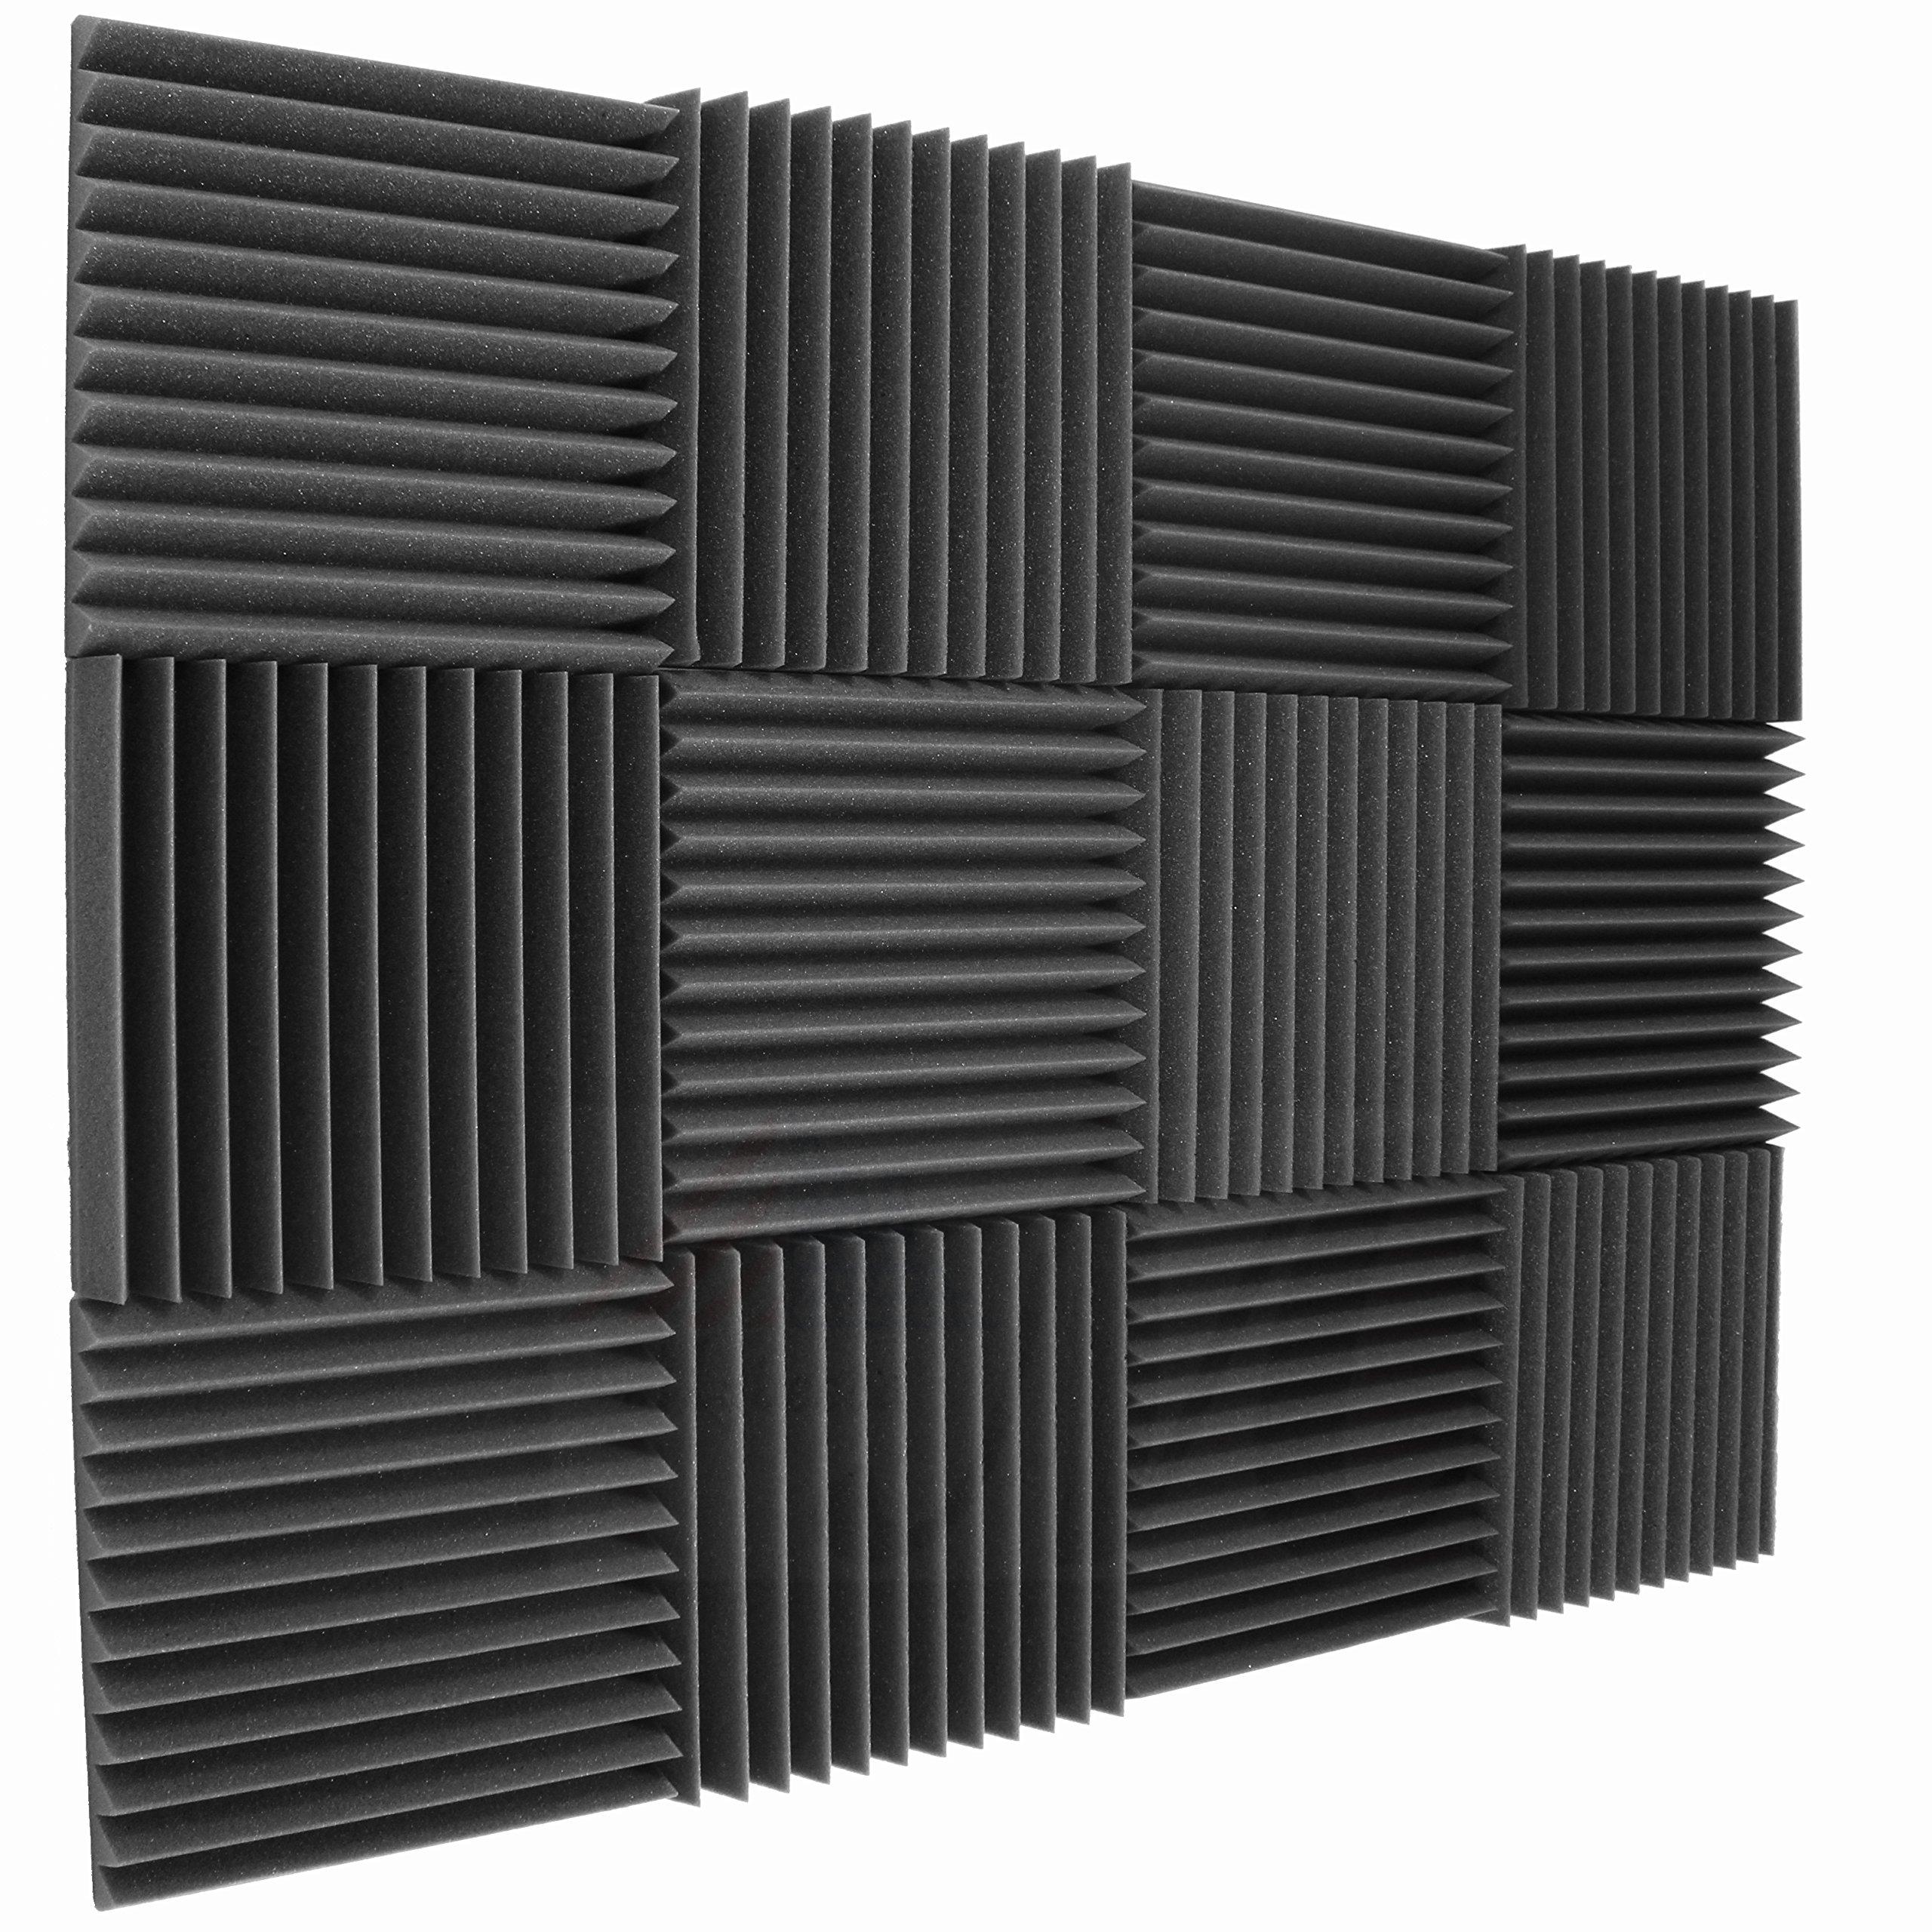 12 Pack Acoustic Panels Studio Foam Wedges 2'' X 12'' X 12''